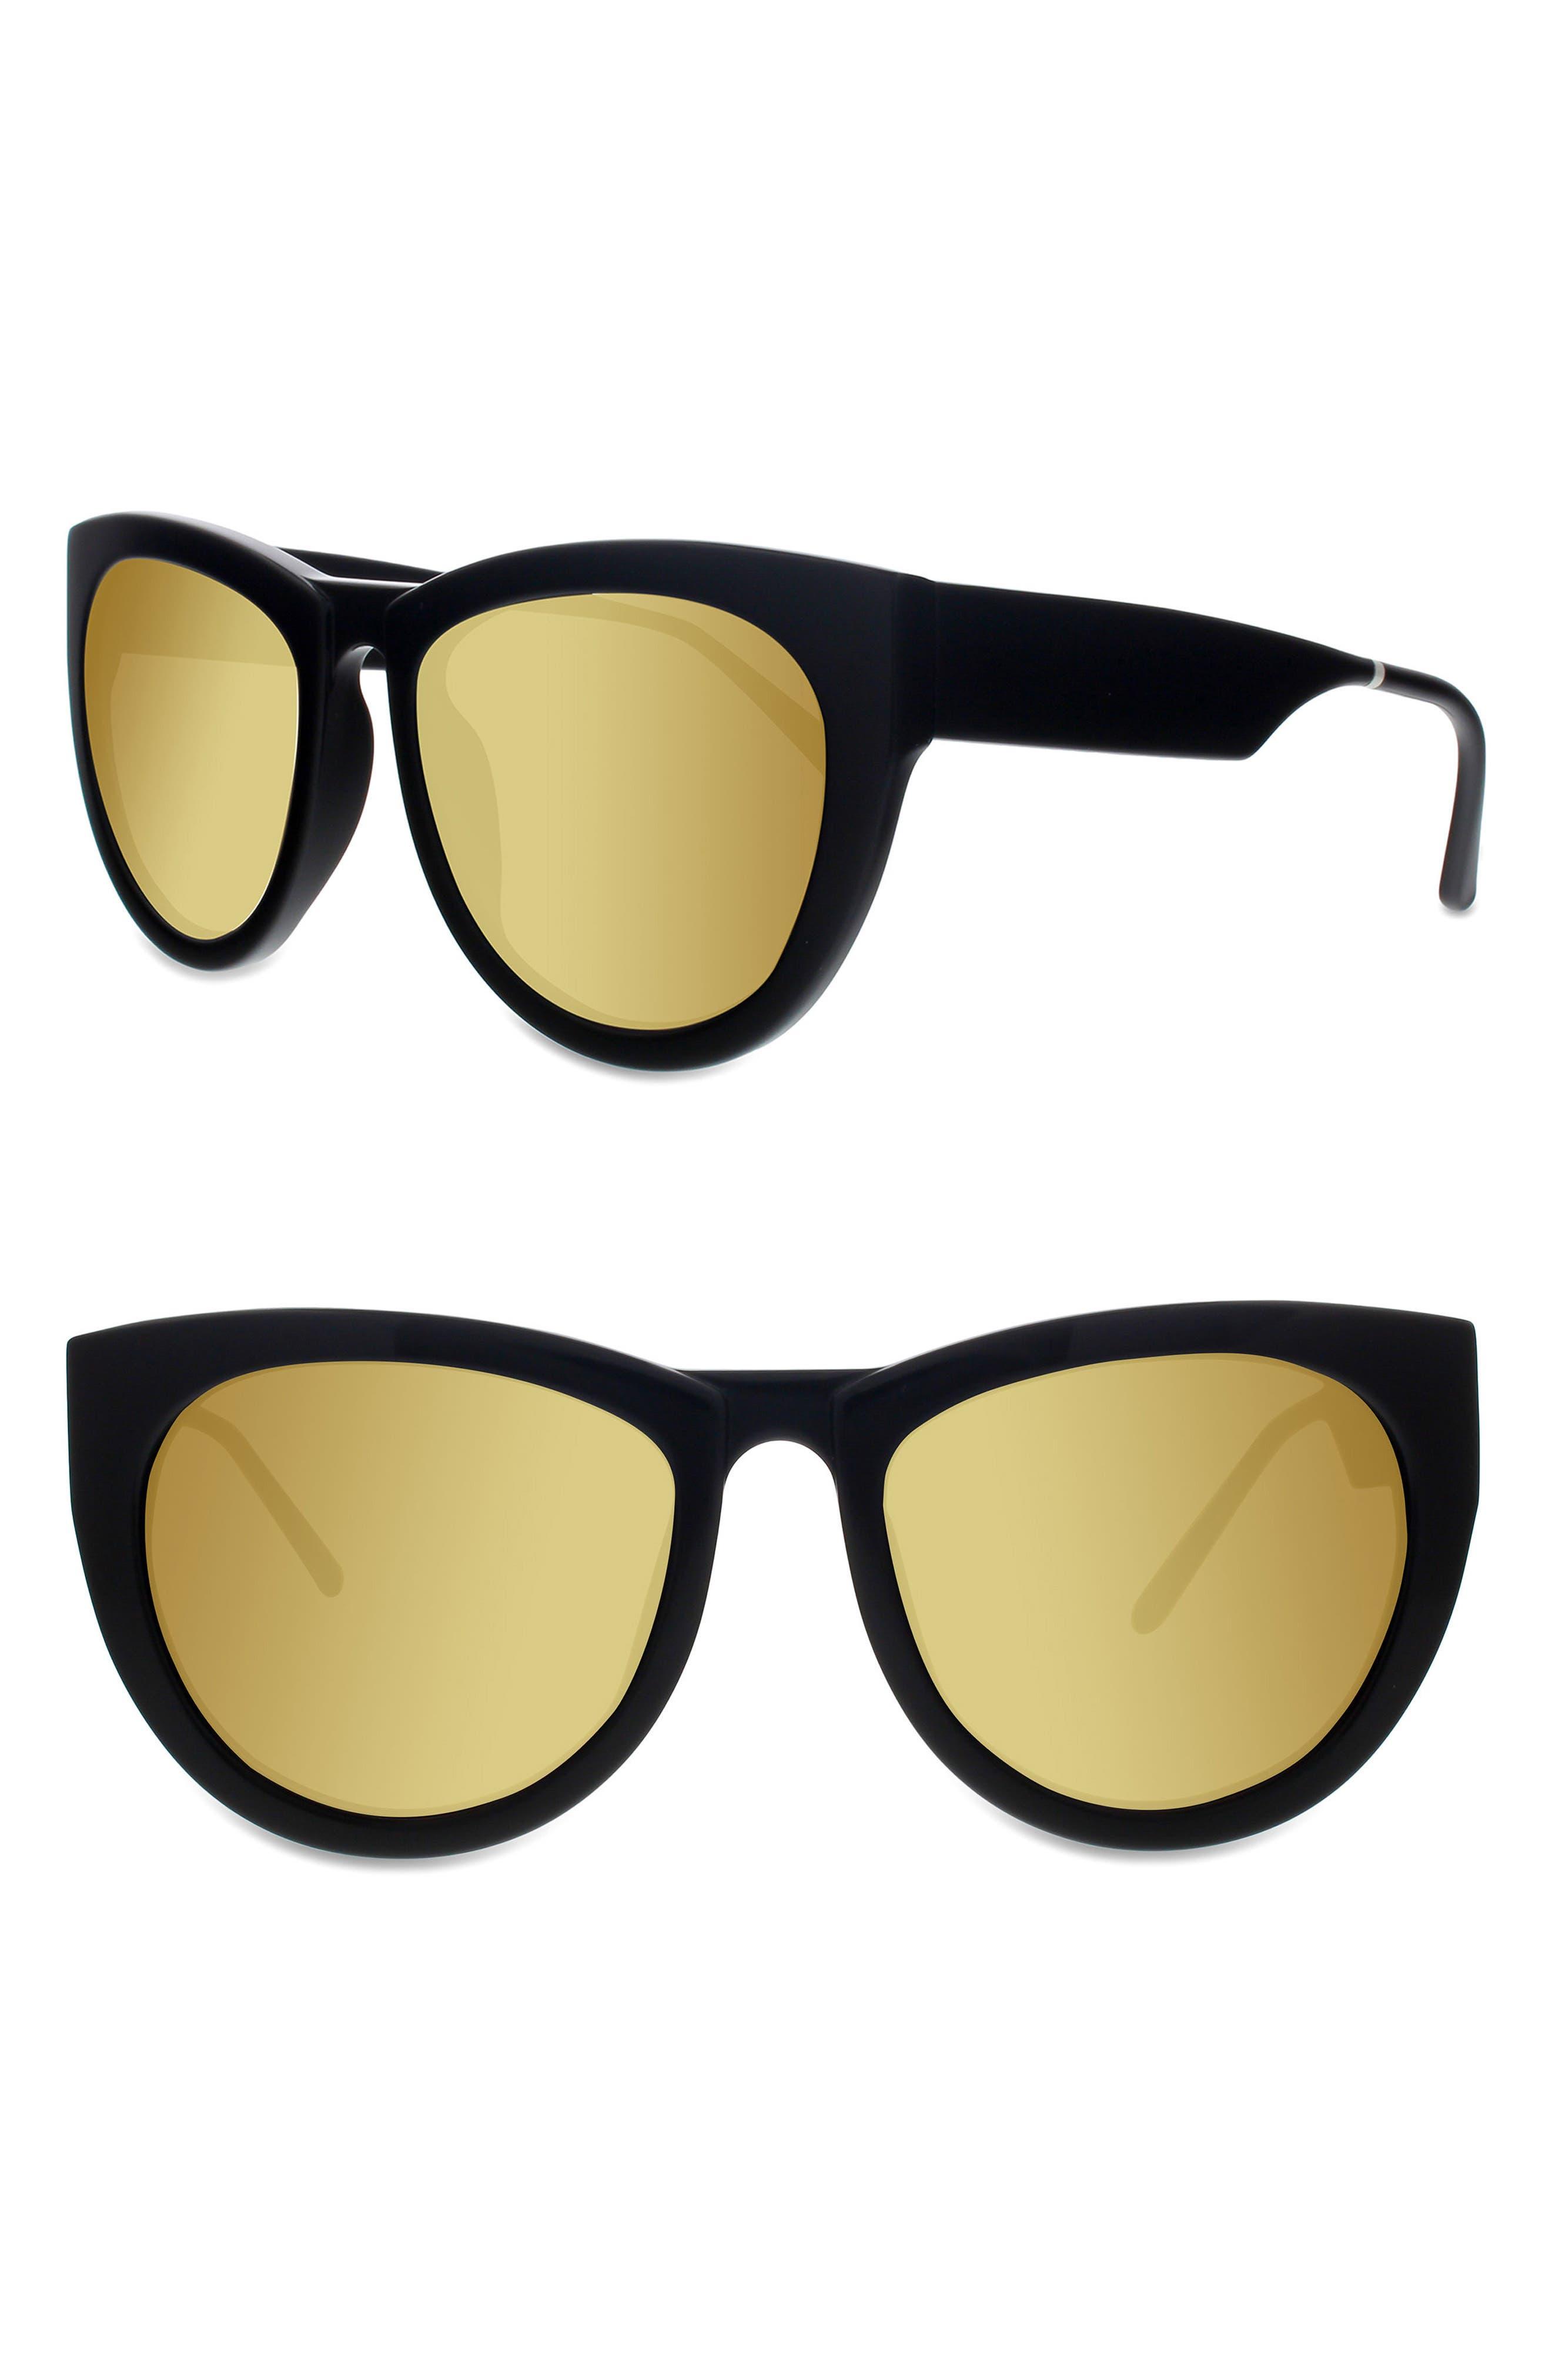 Runaround Sue 60mm Cat Eye Sunglasses,                         Main,                         color, Black/ Gold Mirror